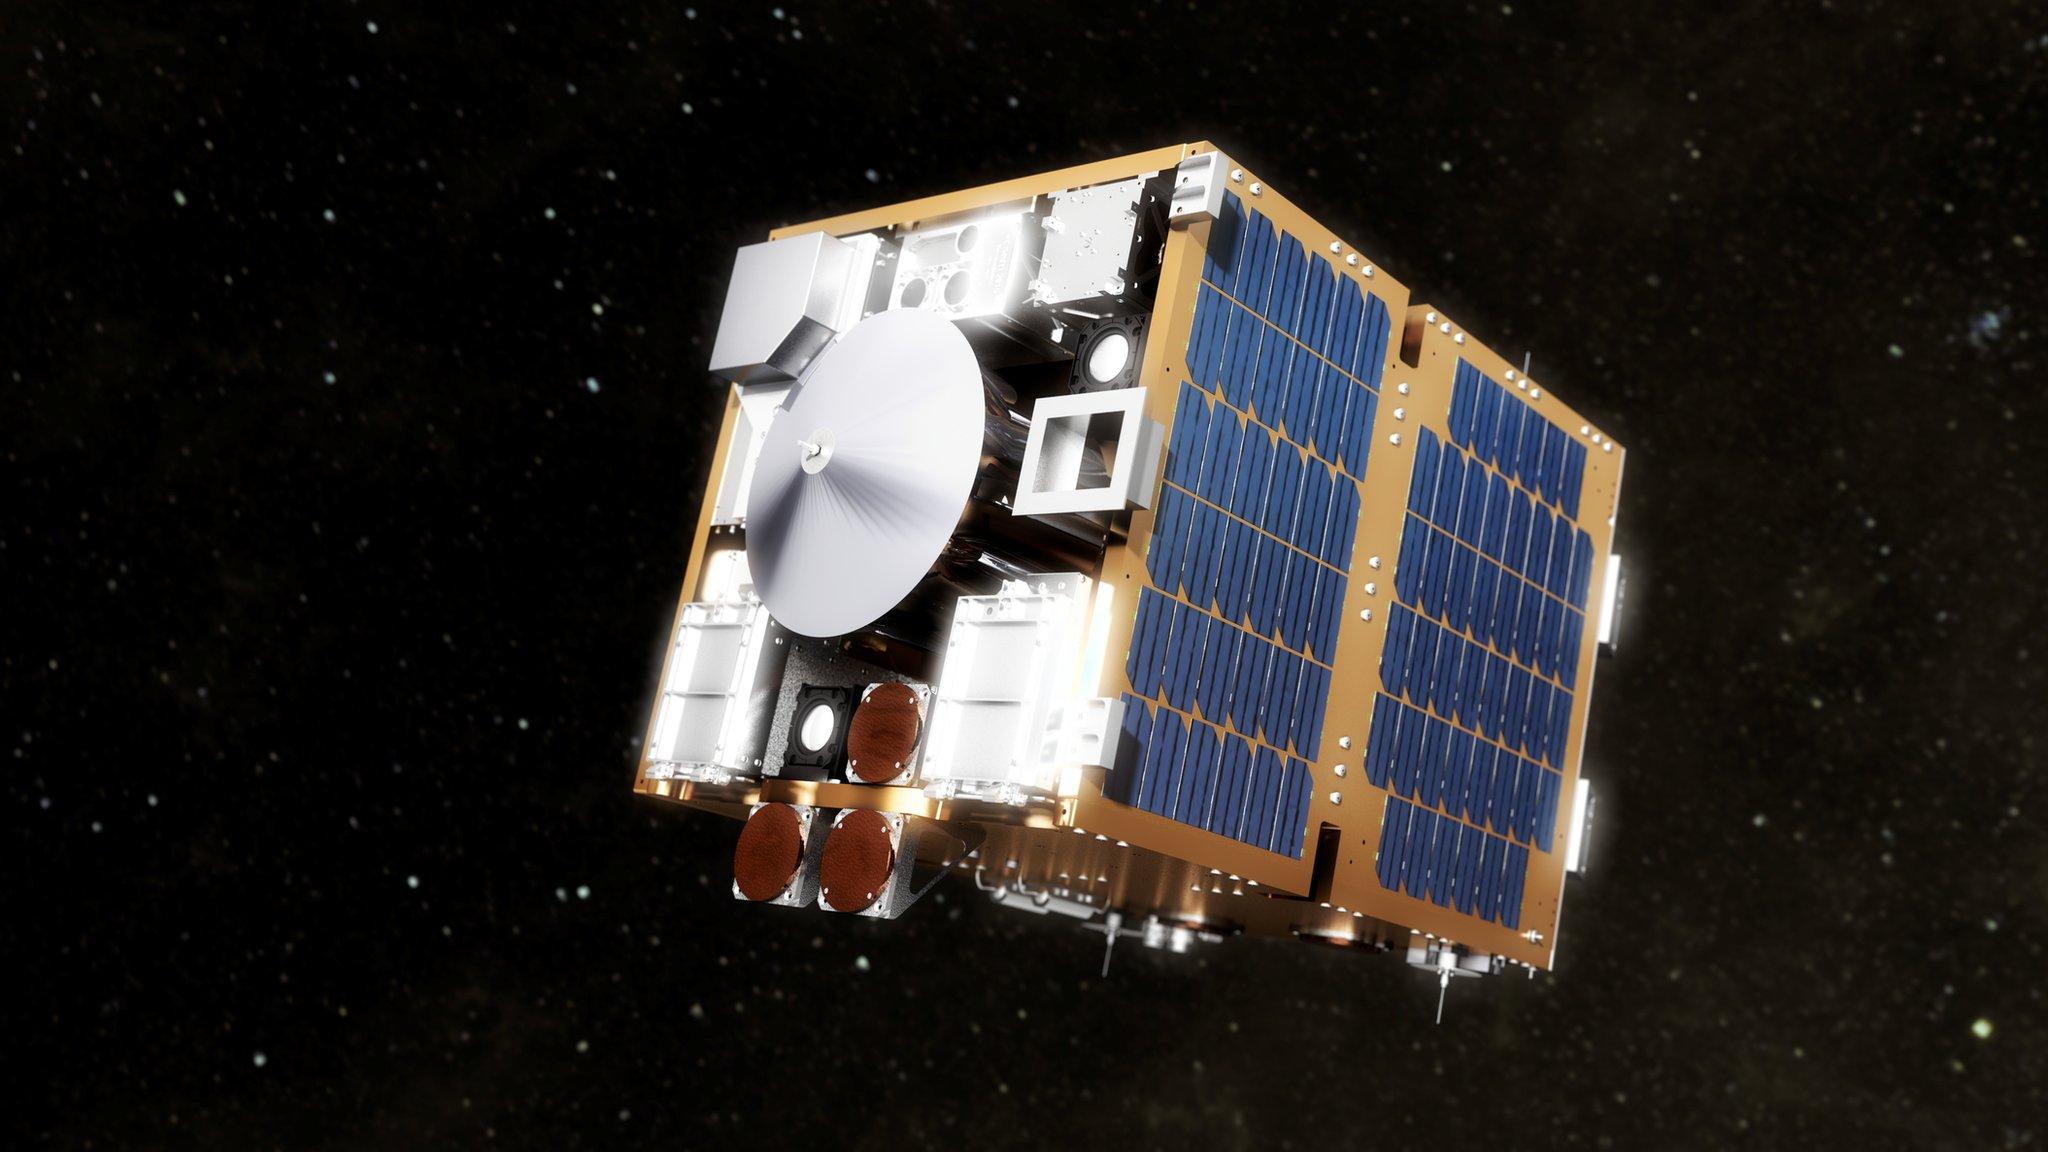 RemoveDebris: Space junk mission prepares for launch